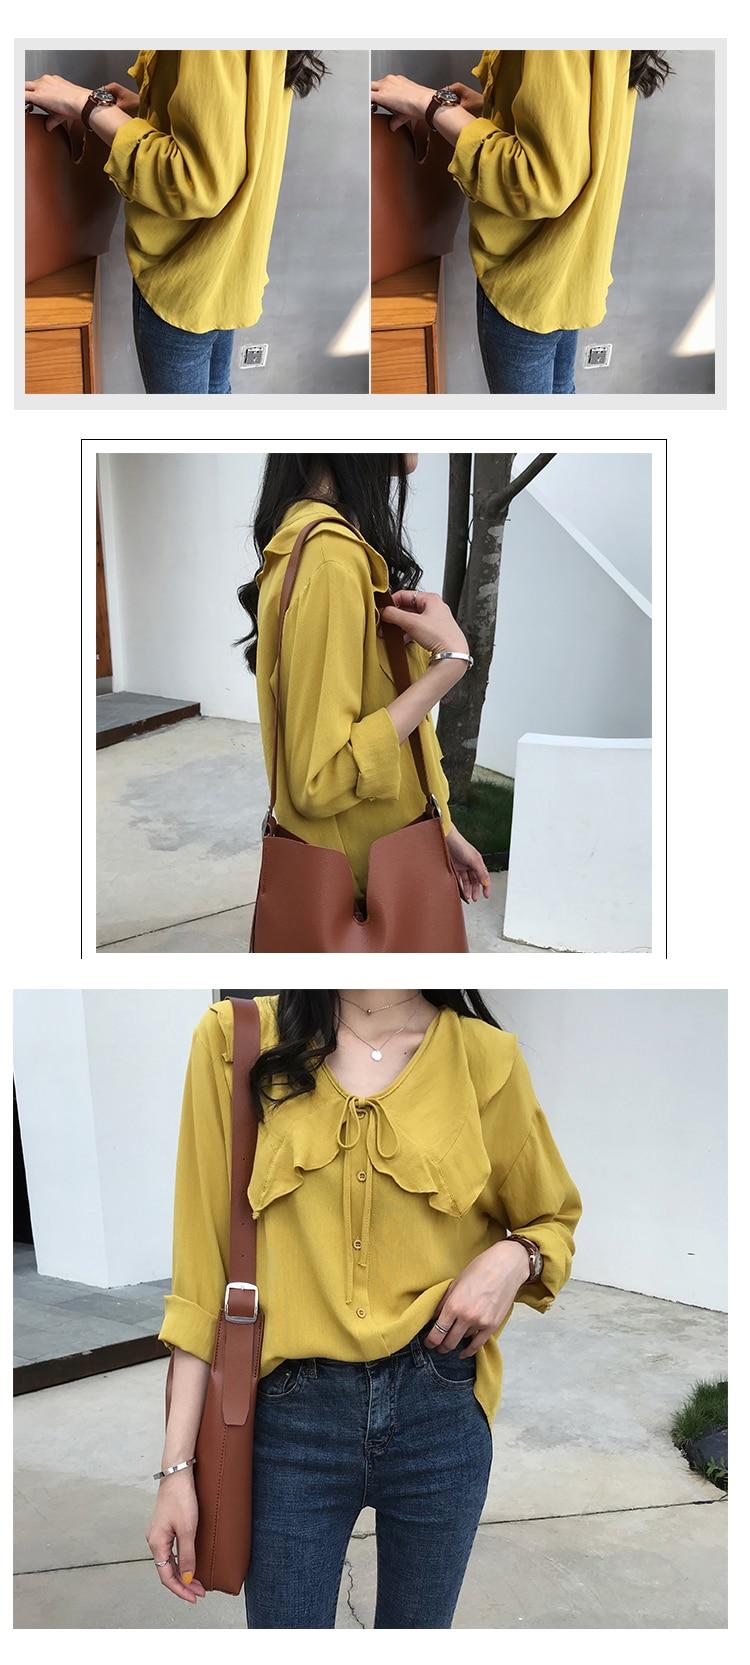 Kimono Cardigan Cotton Linen Peter Pan Collar Womens Tops and Blouses Tie Bow Shirt Loose Oversized Casual Ruffles Blouse Women 14 Online shopping Bangladesh